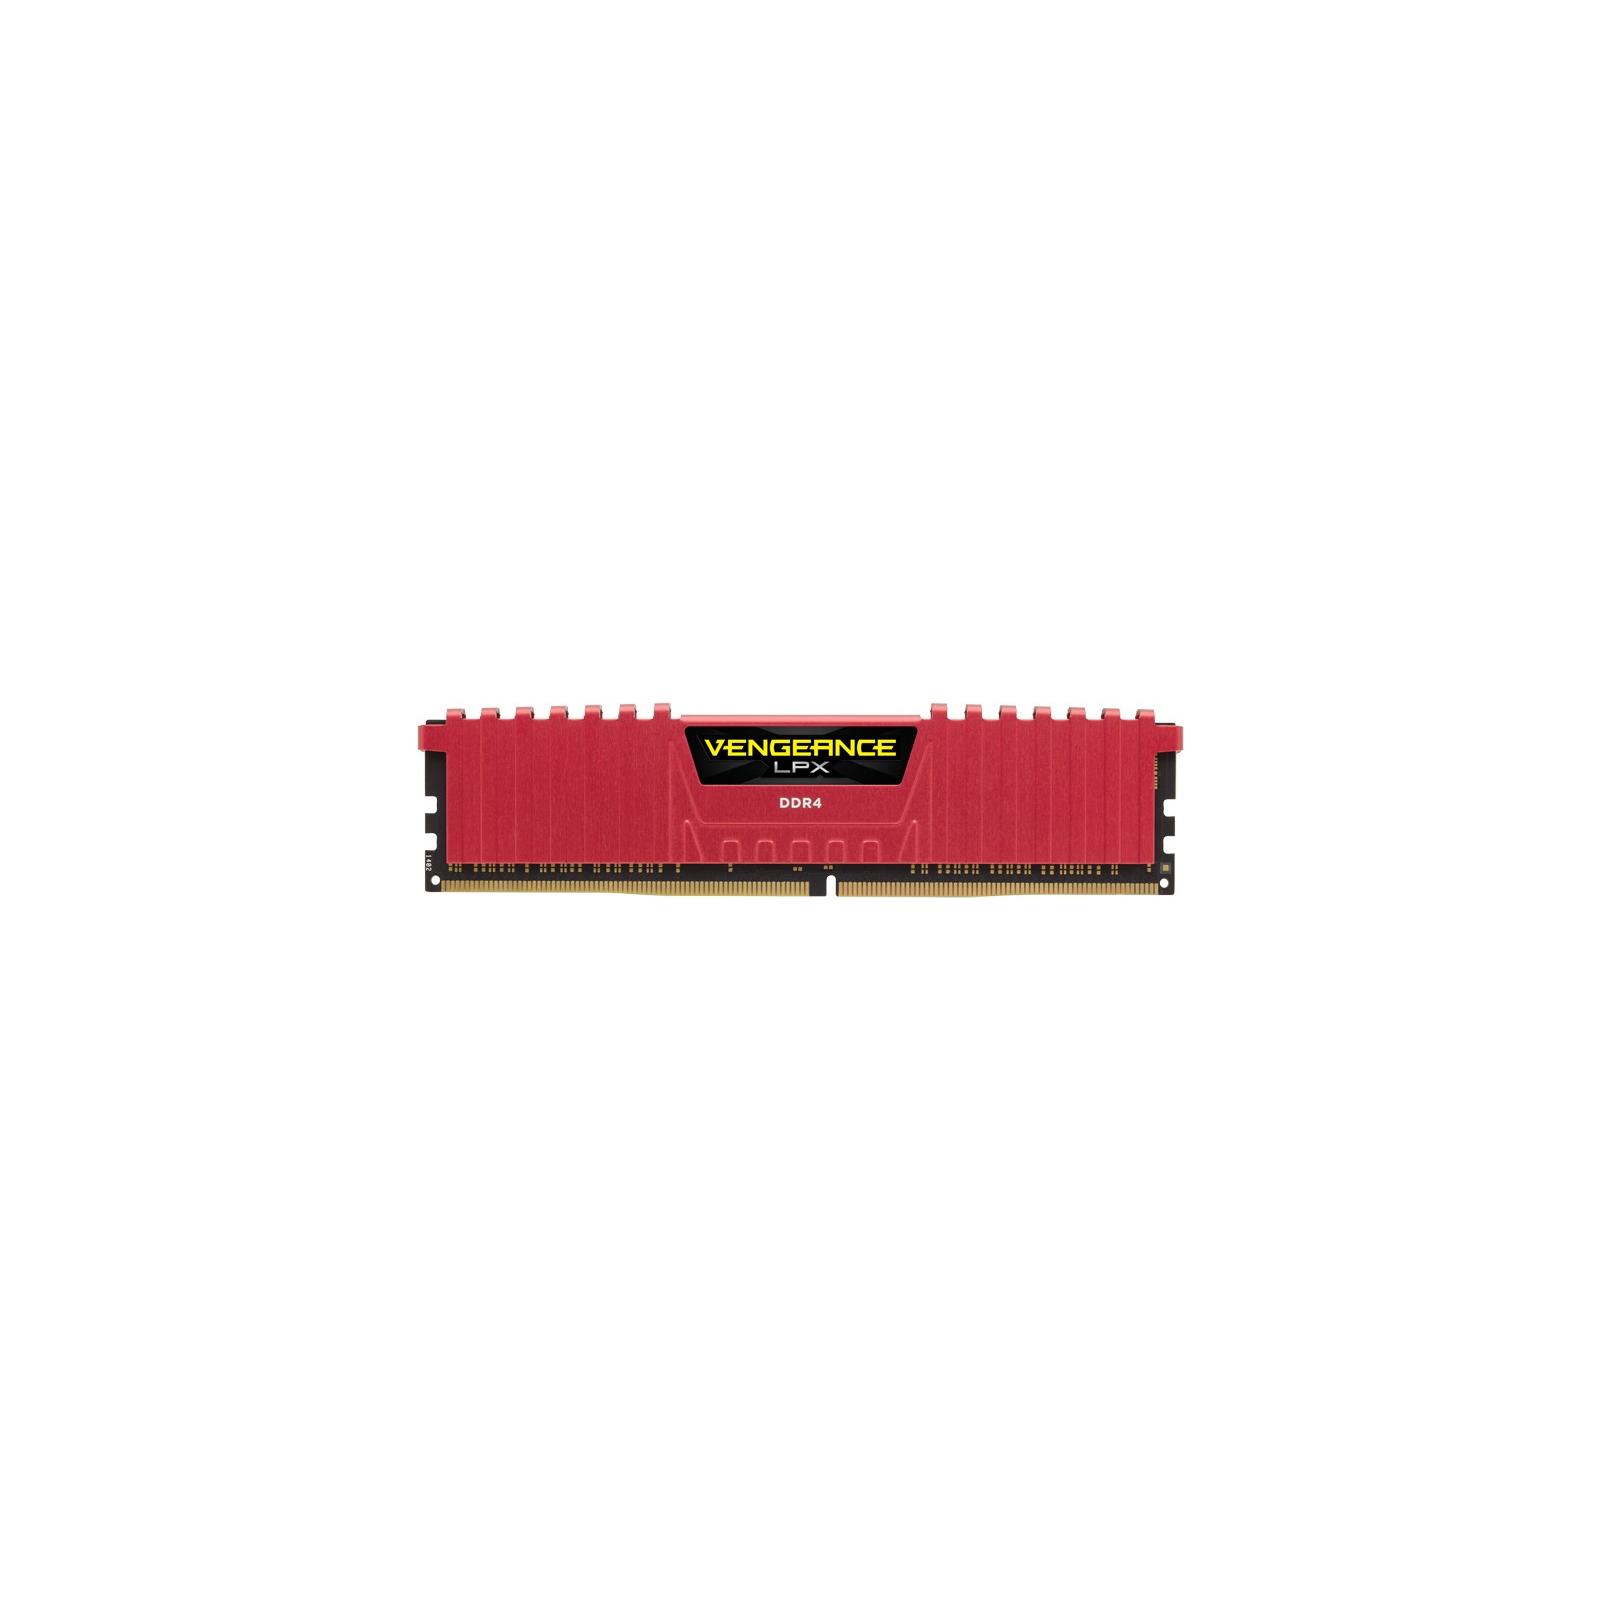 Модуль памяти для компьютера DDR4 4GB 2400 MHz Vengeance LPX Red CORSAIR (CMK4GX4M1A2400C14R)